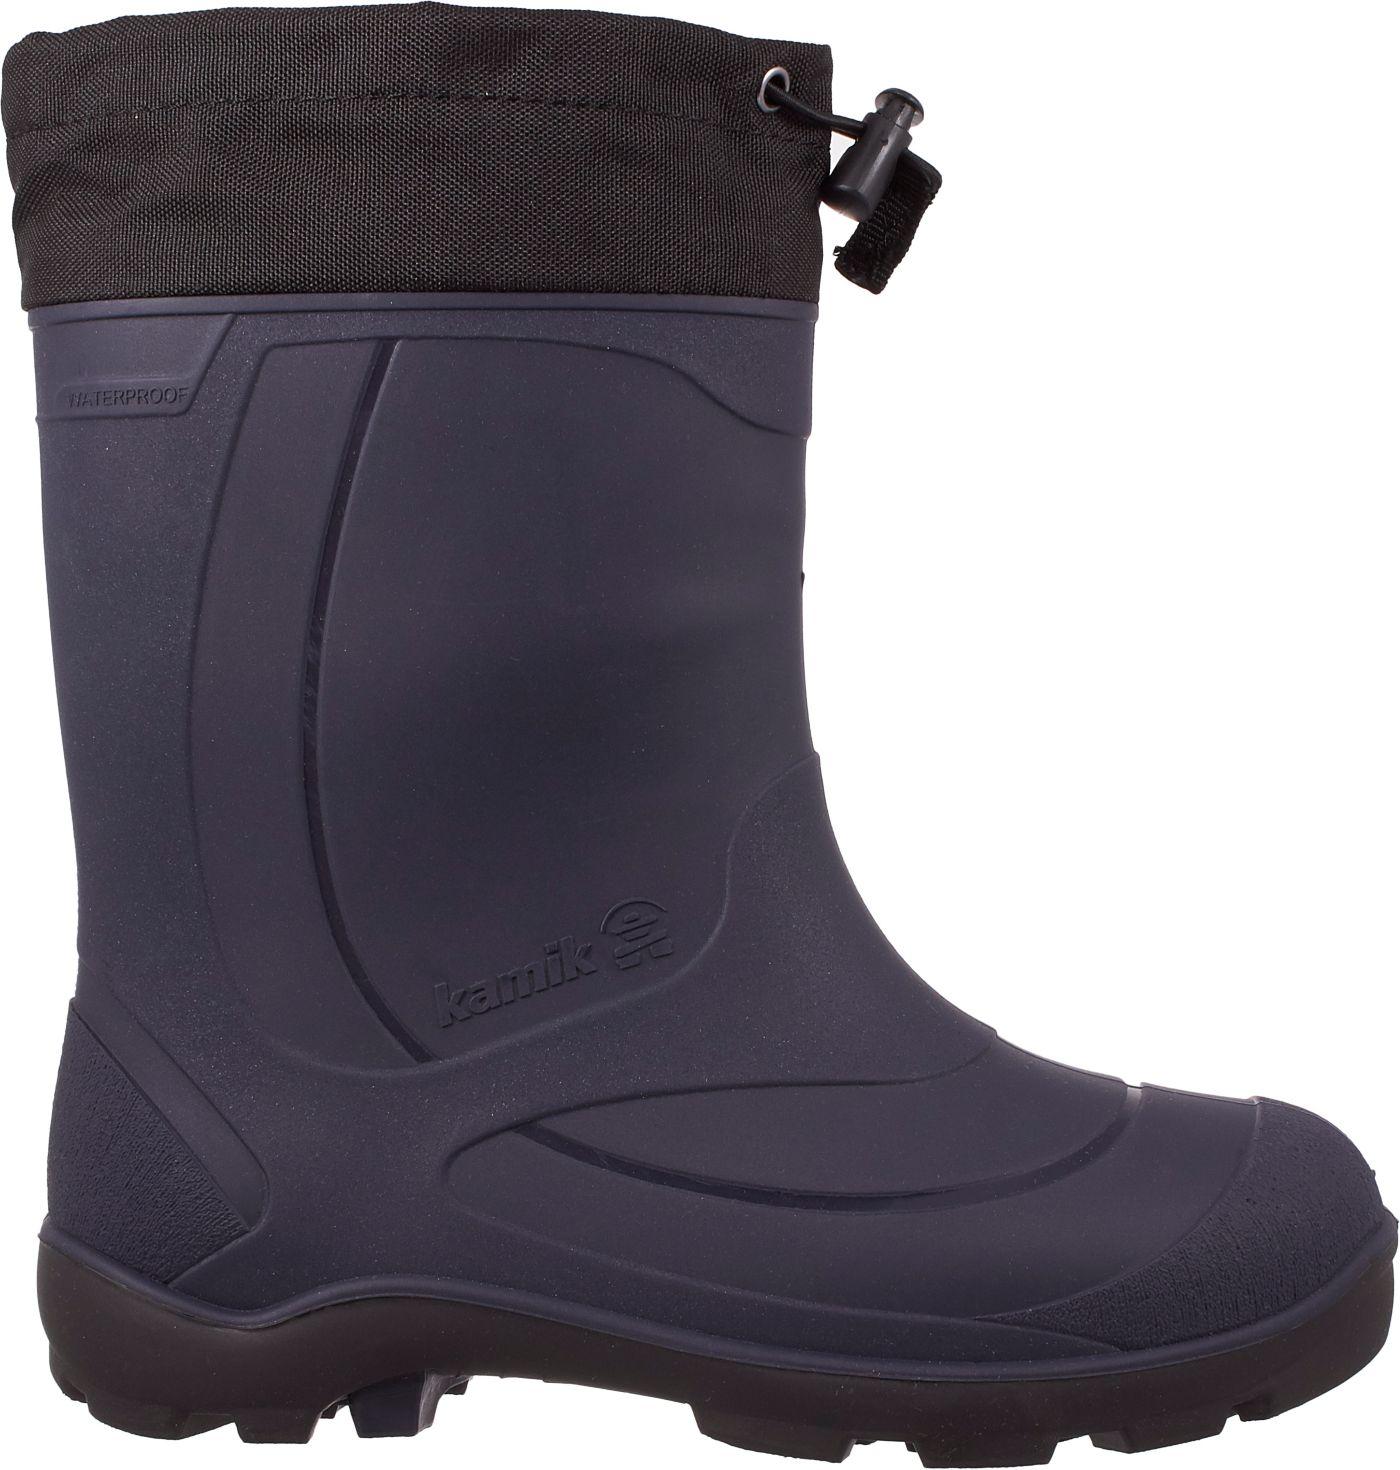 Kamik Kids' Snobuster Insulated Waterproof Winter Boots